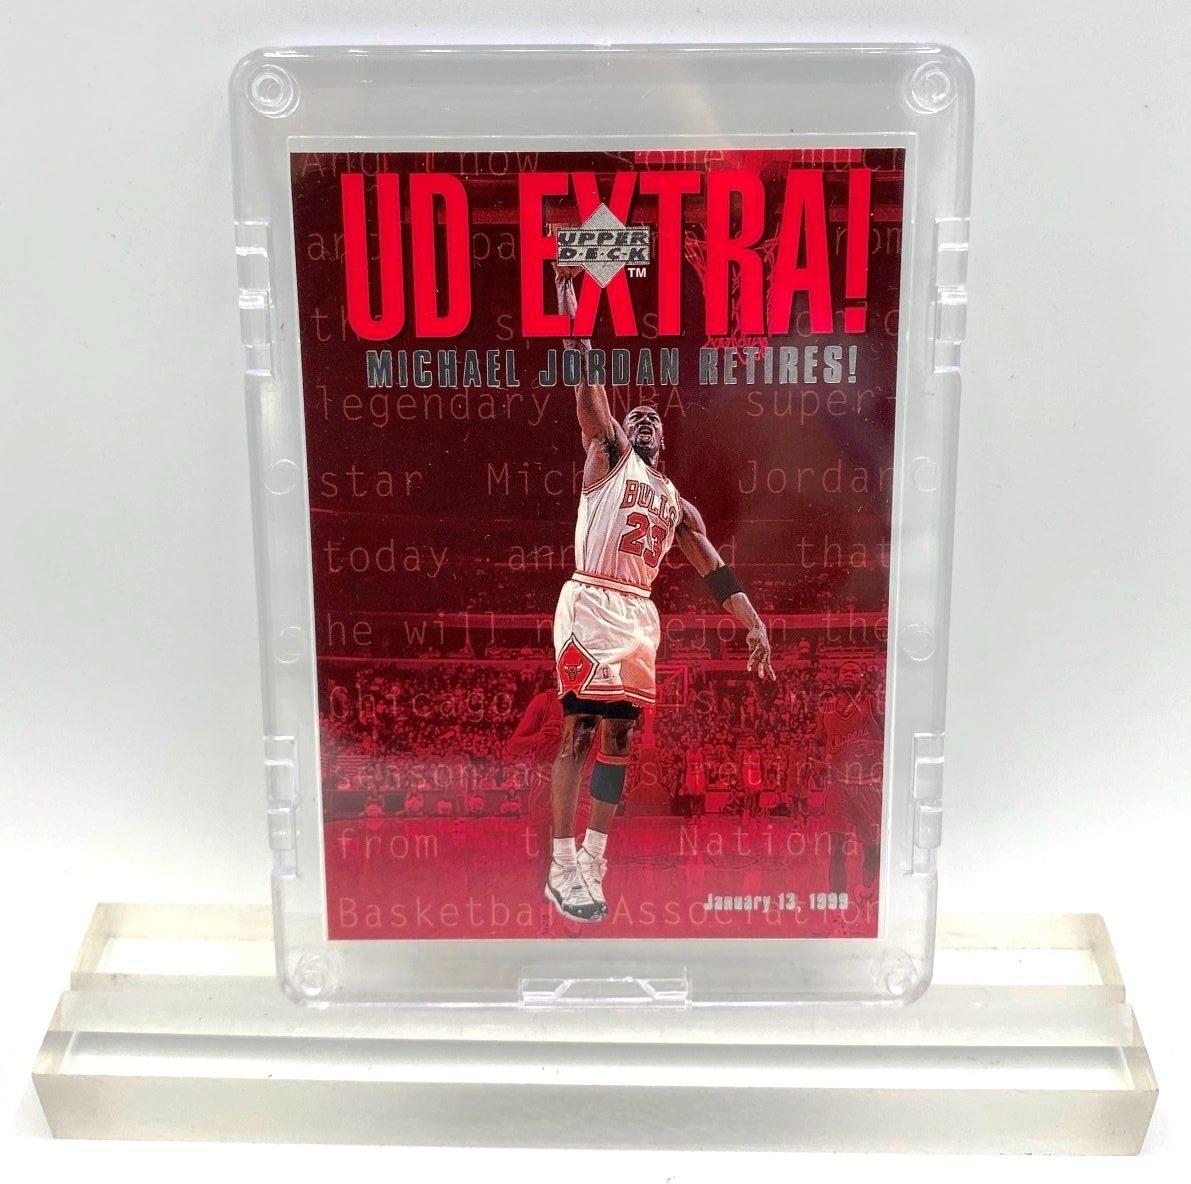 1999 UD EXTRA! Michael Jordan RETIRES! (January 13, 1999 Card #UDX) (1)